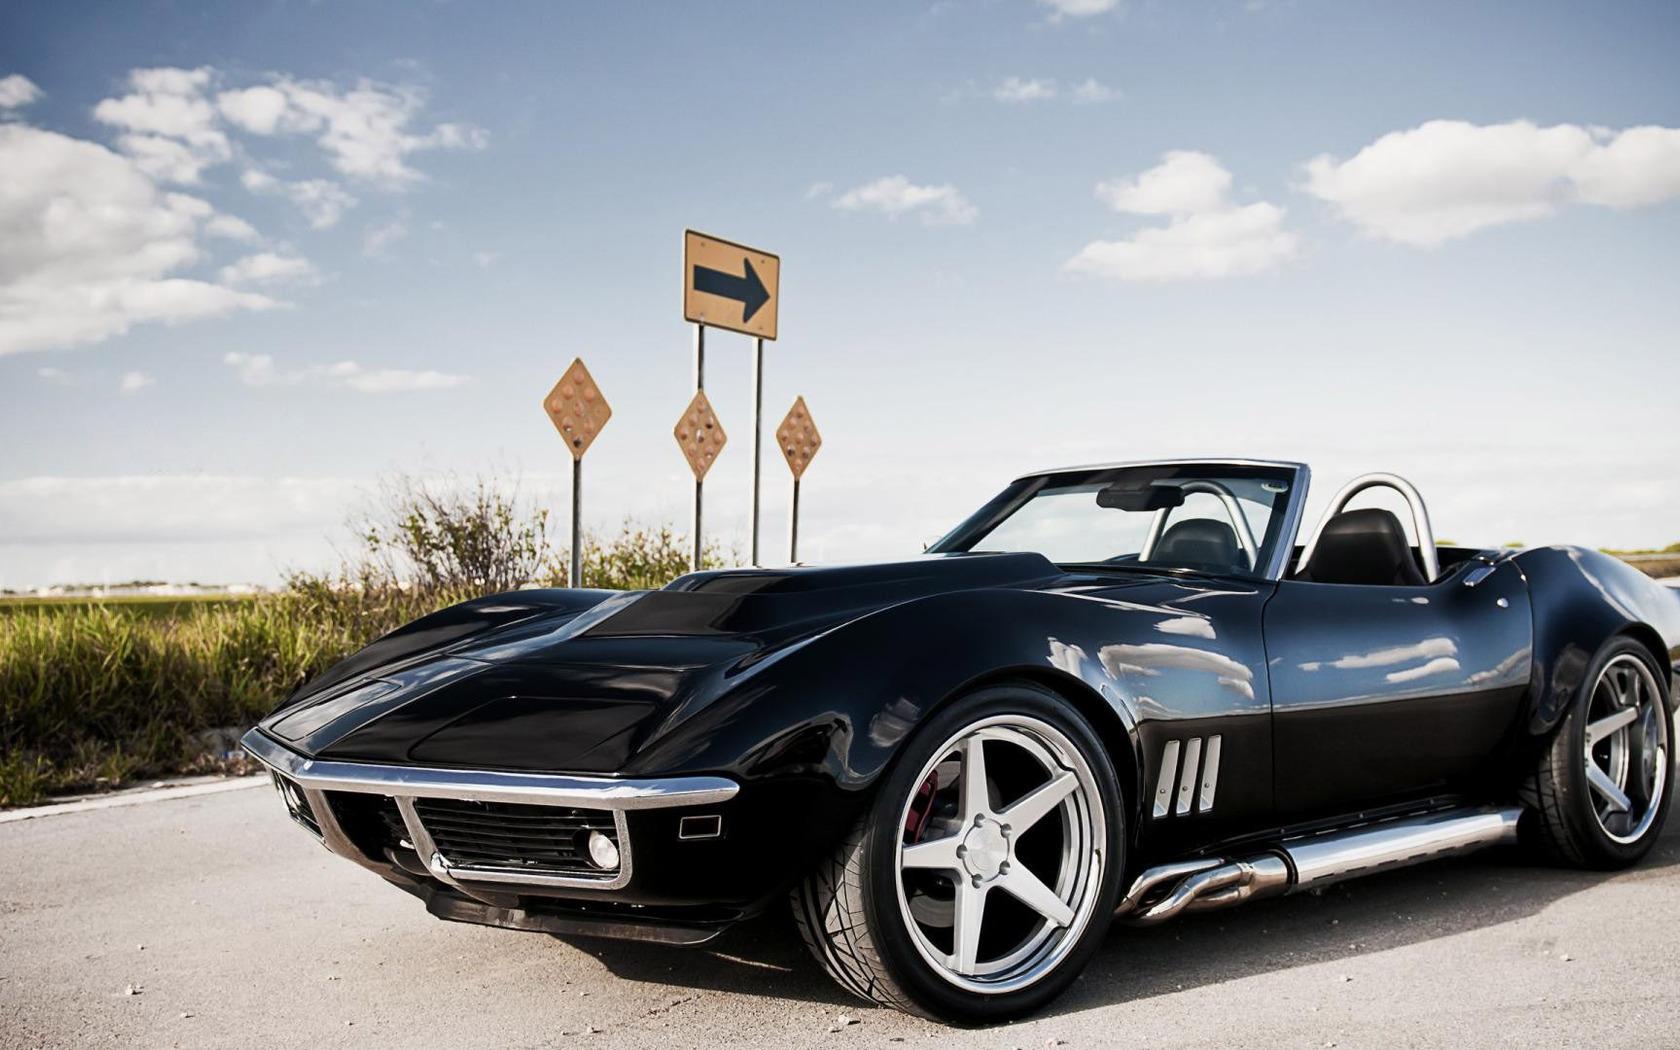 c3 corvette wallpaper wallpapersafari. Black Bedroom Furniture Sets. Home Design Ideas